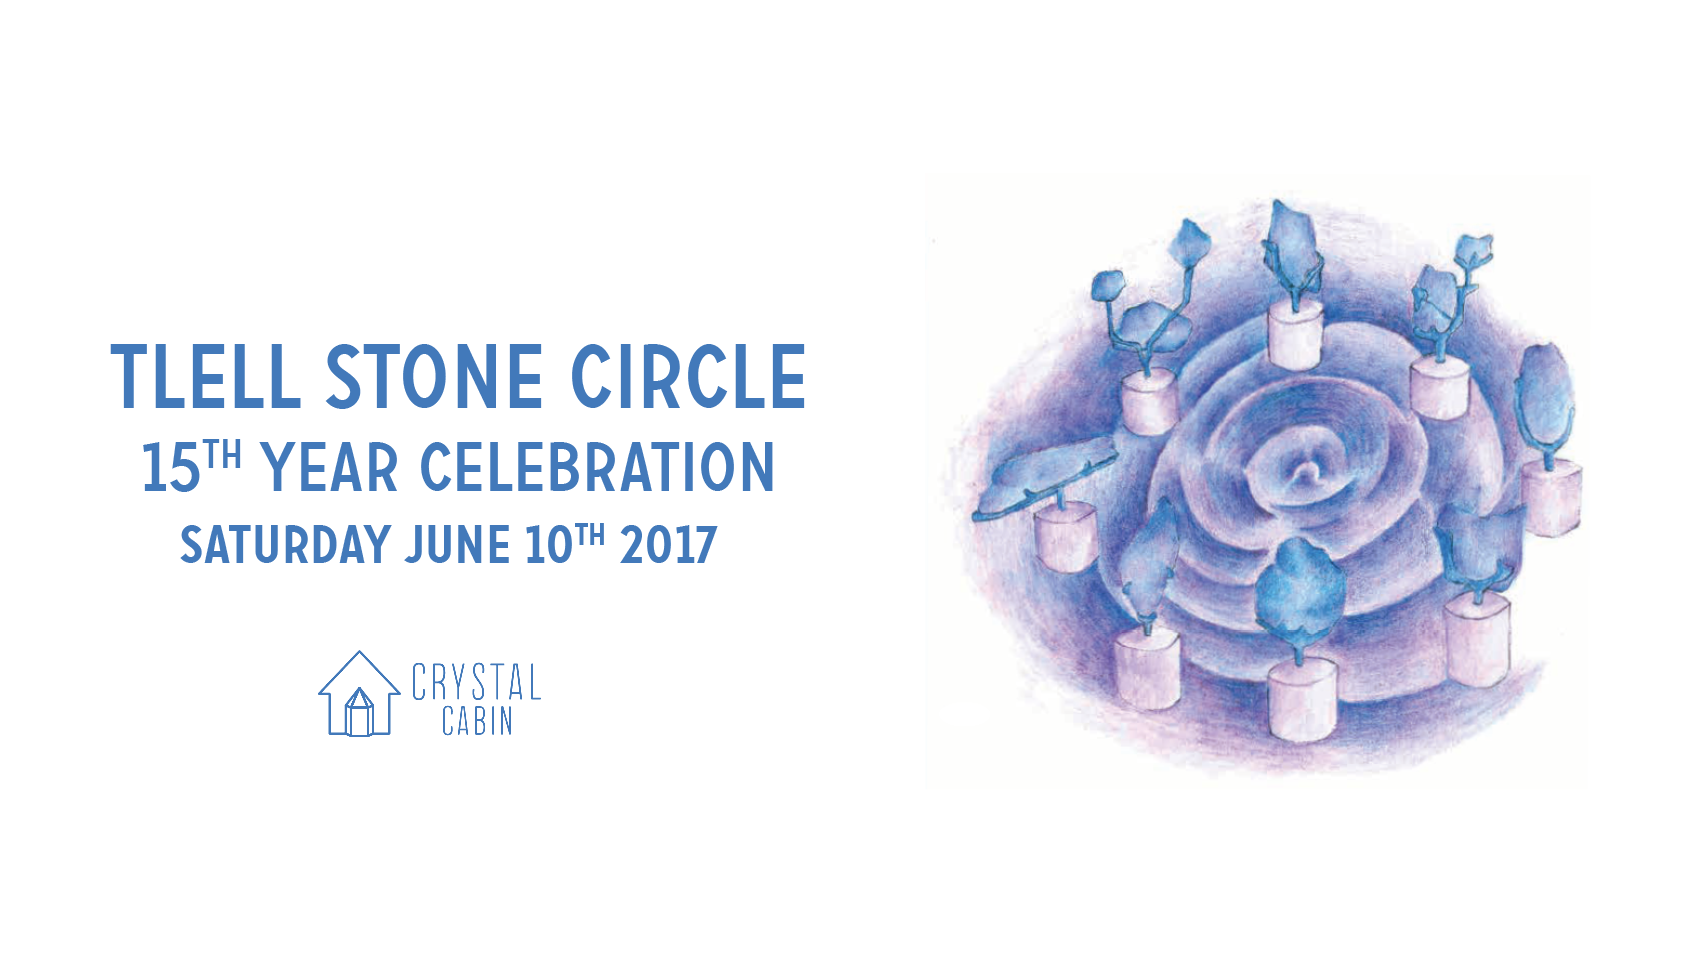 Haida Gwaii Tlell Stone Circle